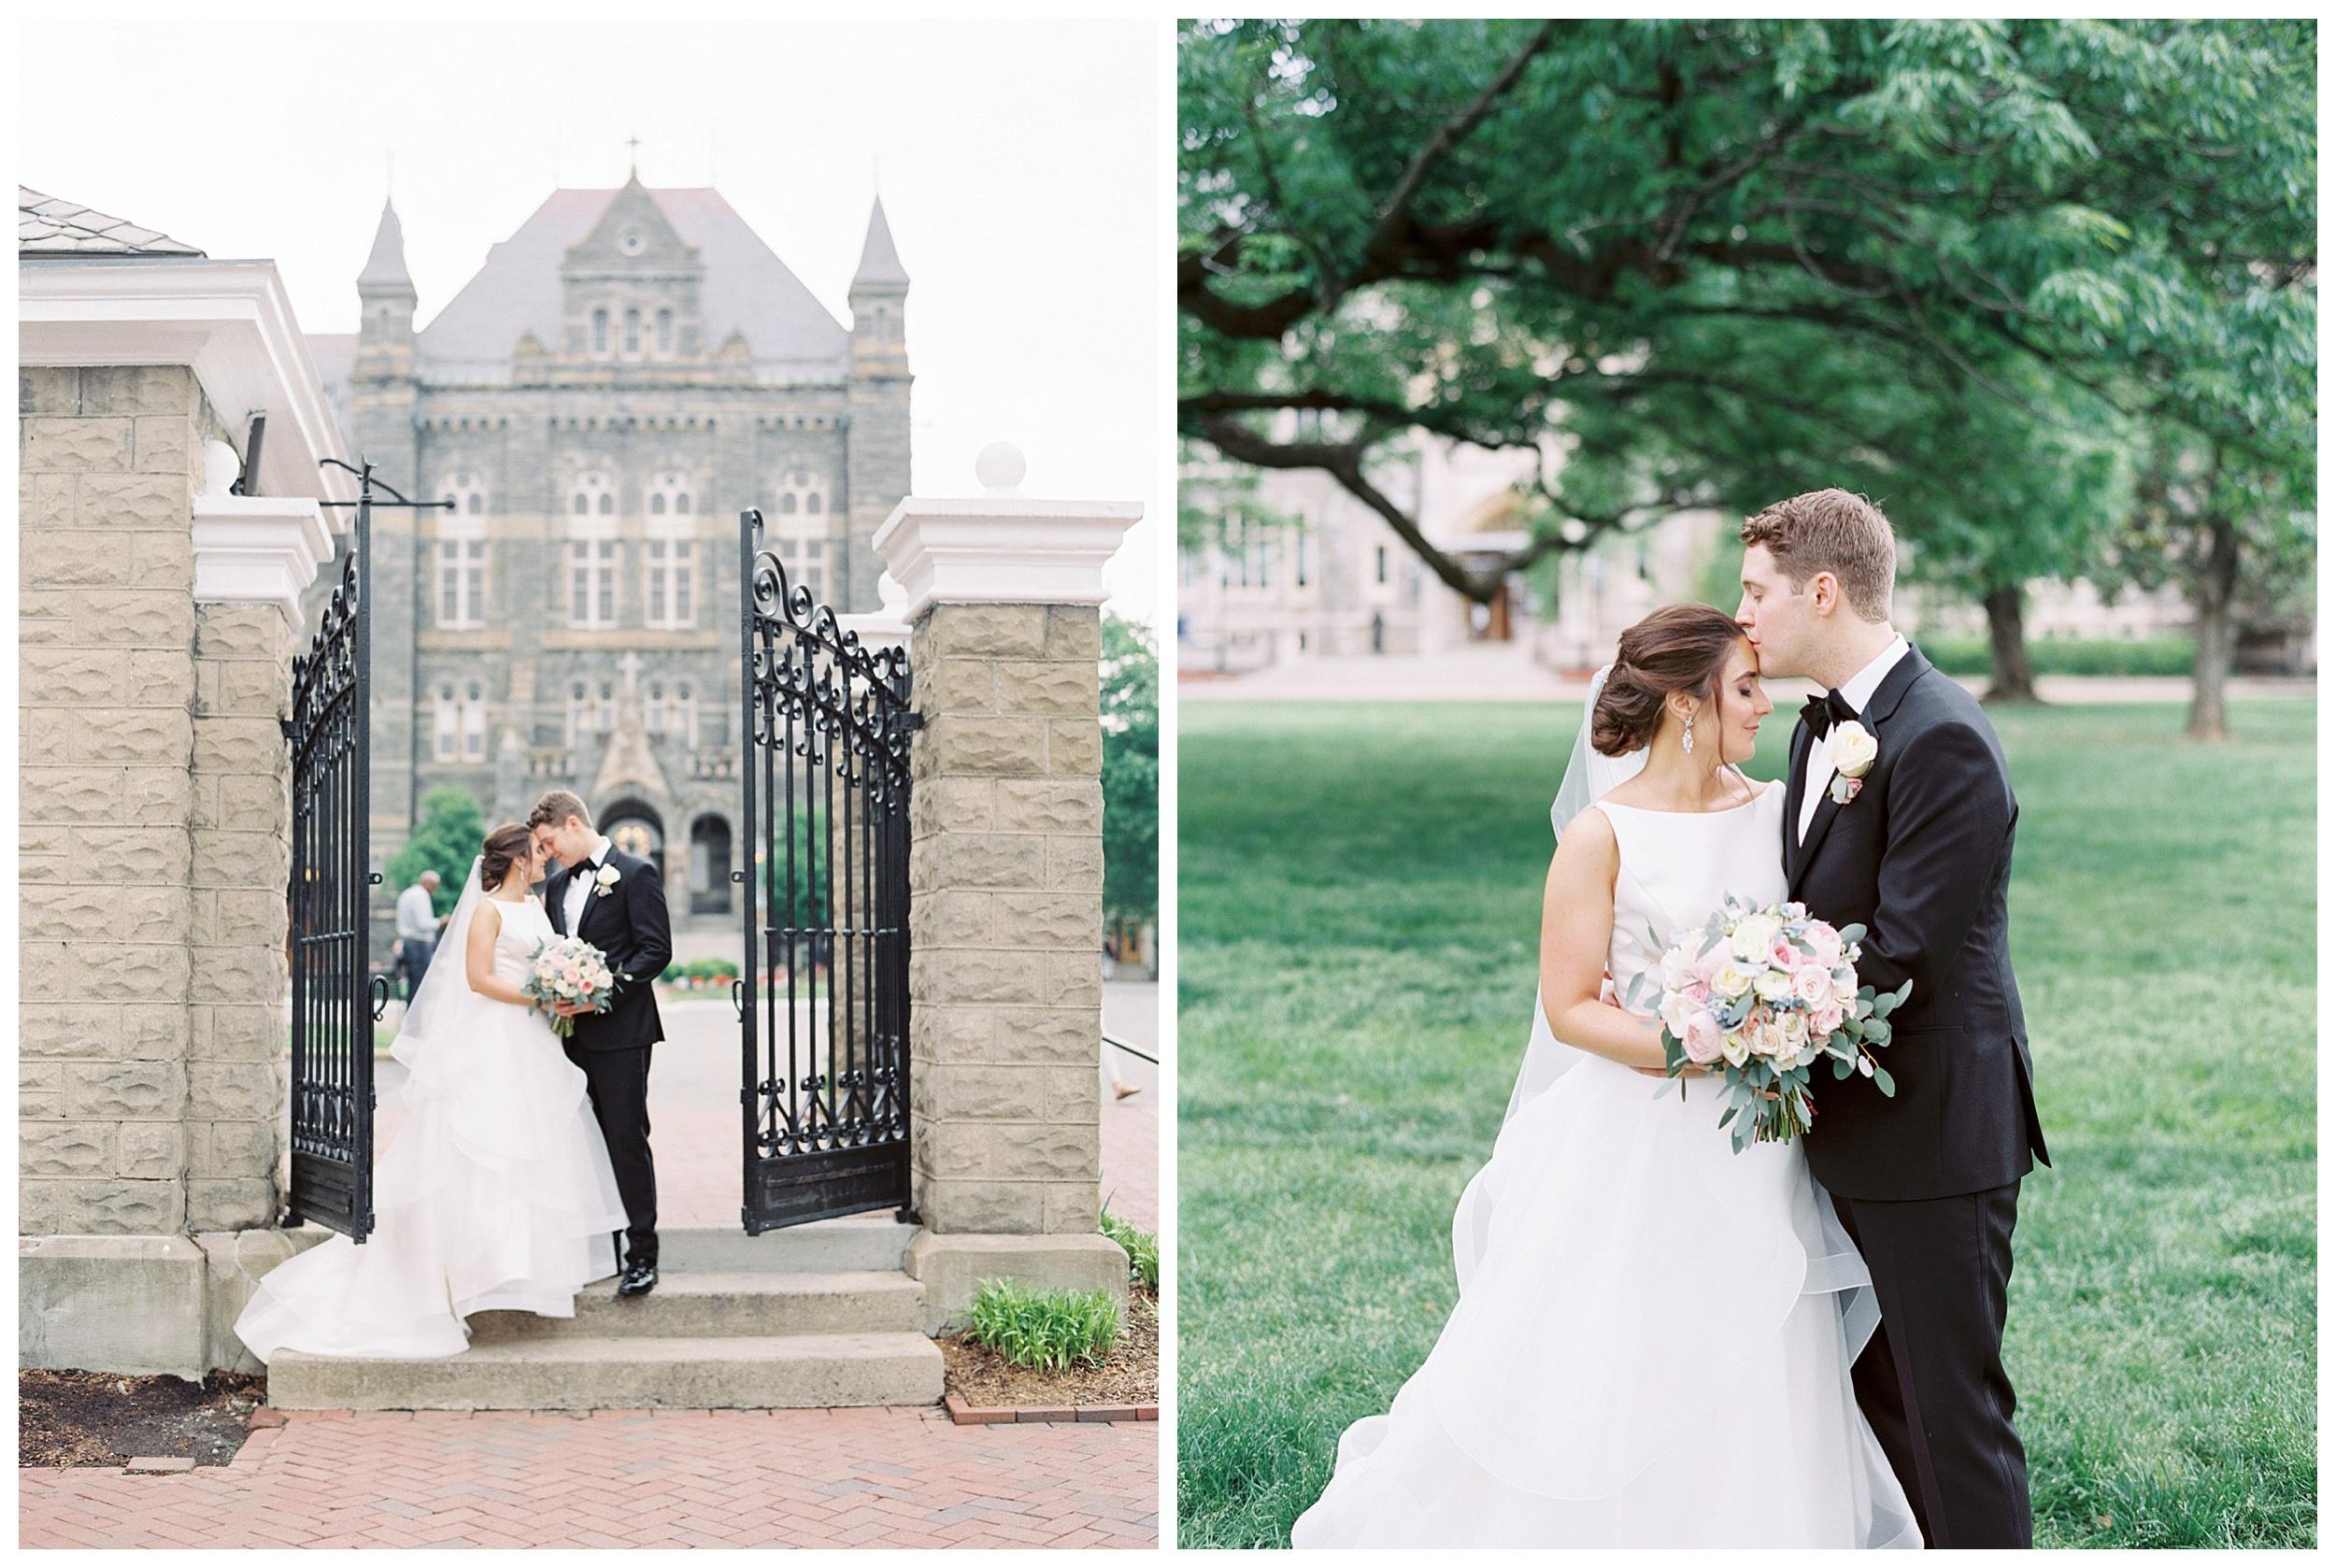 DAR Constitution Hall Wedding Wedding | Daughters of the American Revolution Wedding | District of Columbia Film Wedding Photographer Kir Tuben_0066.jpg